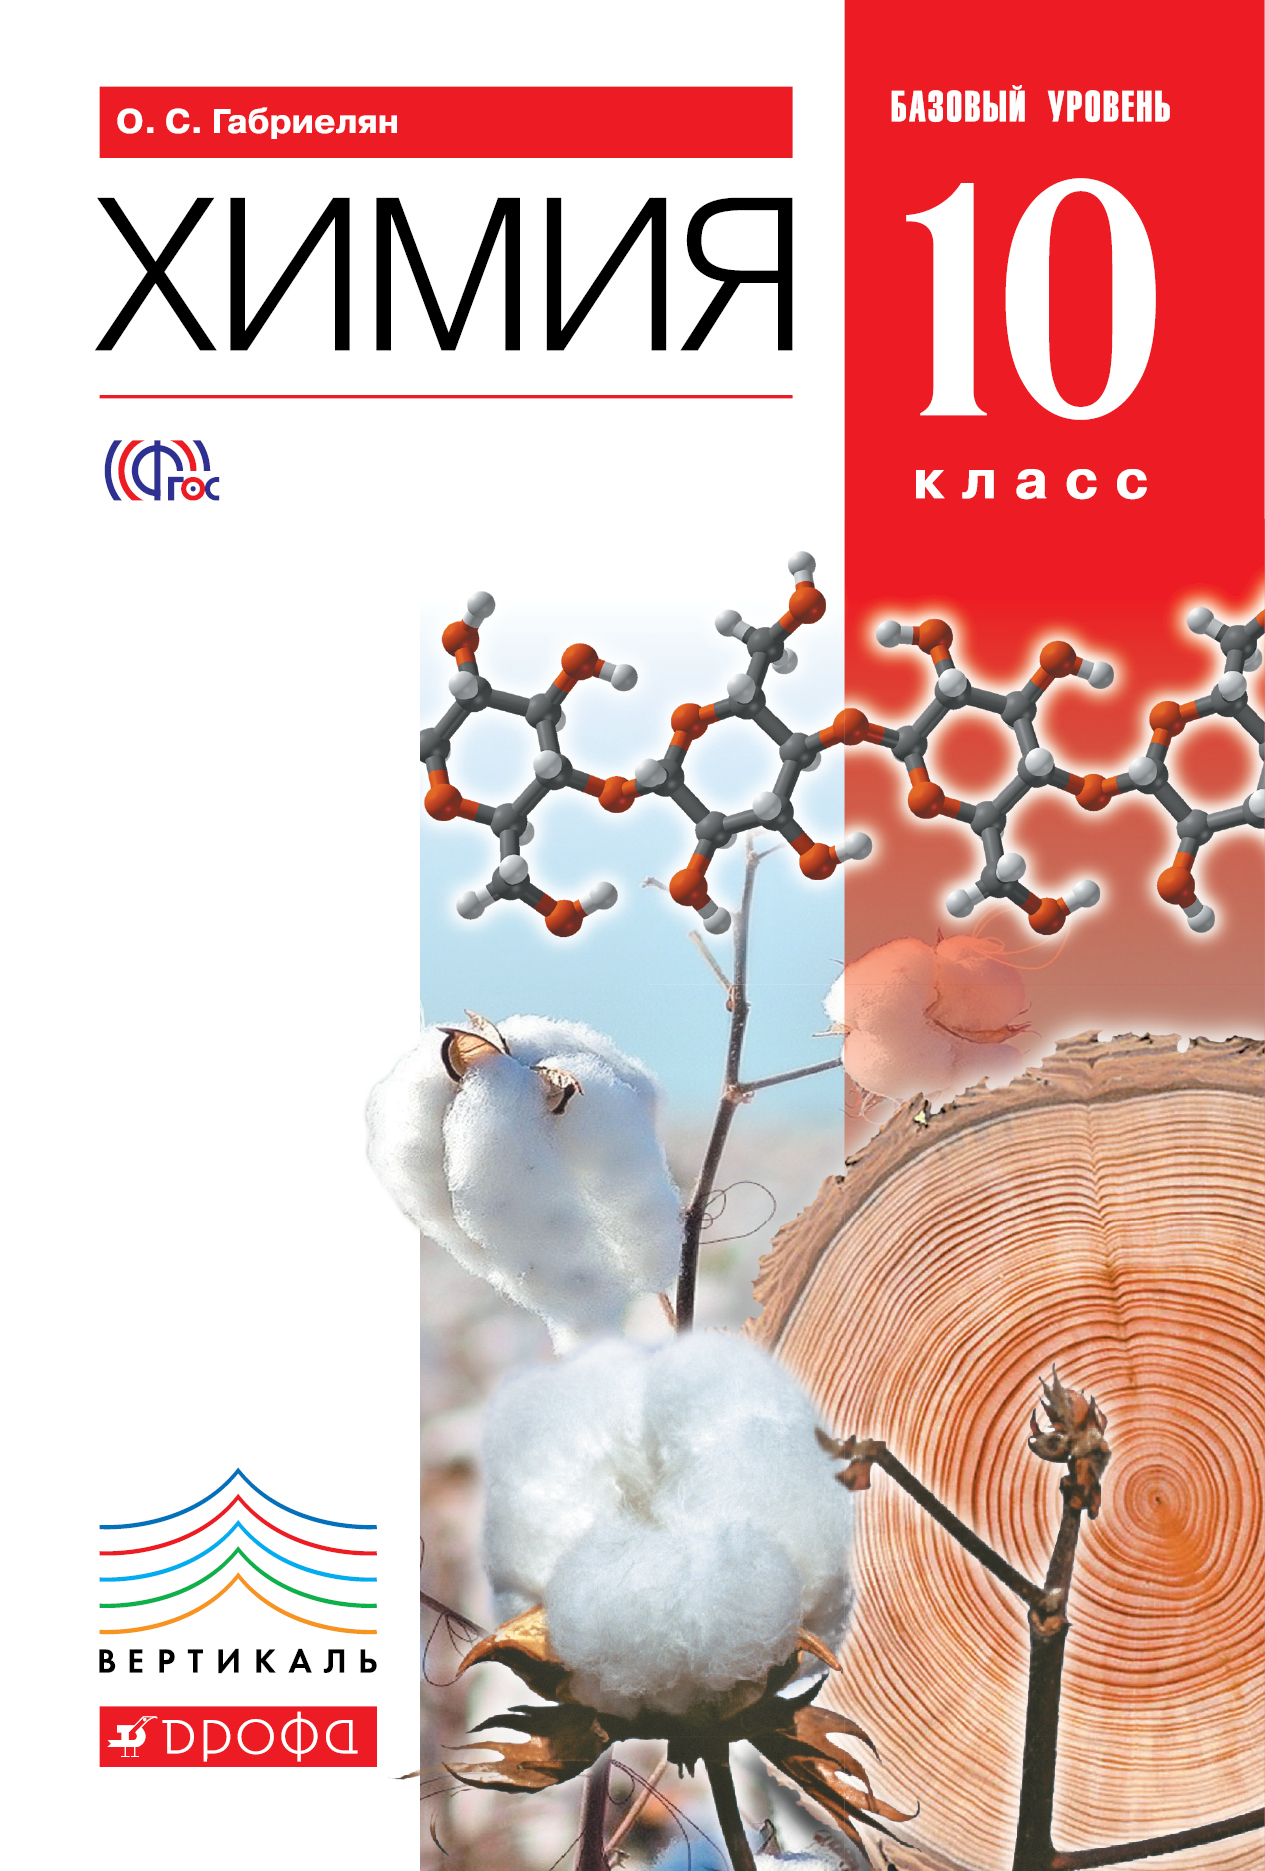 Химия 10кл [Учебник] баз. ур. ВЕРТИКАЛЬ ФП